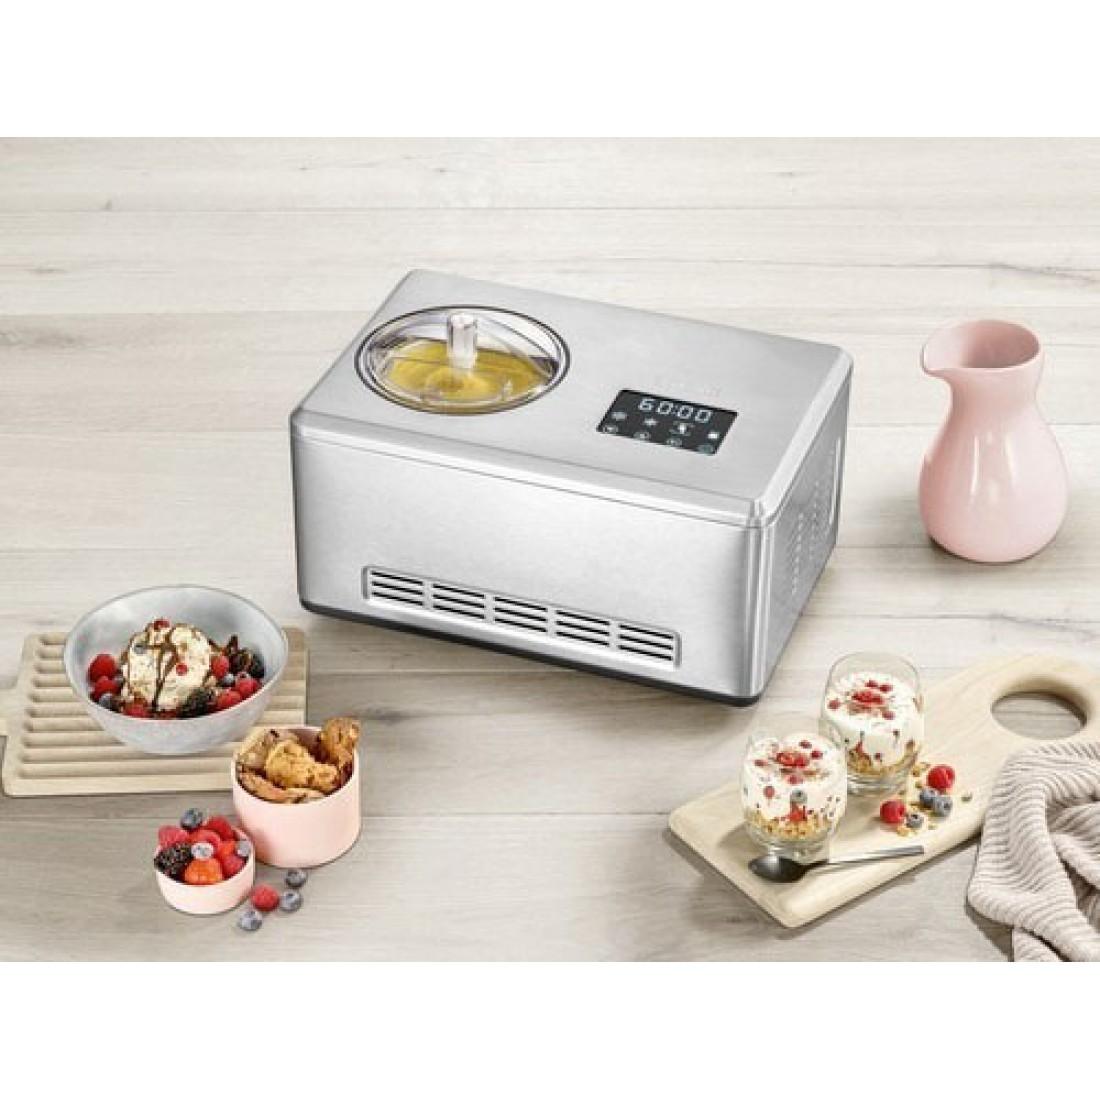 Домашняя мороженица SEVERIN EZ-7406